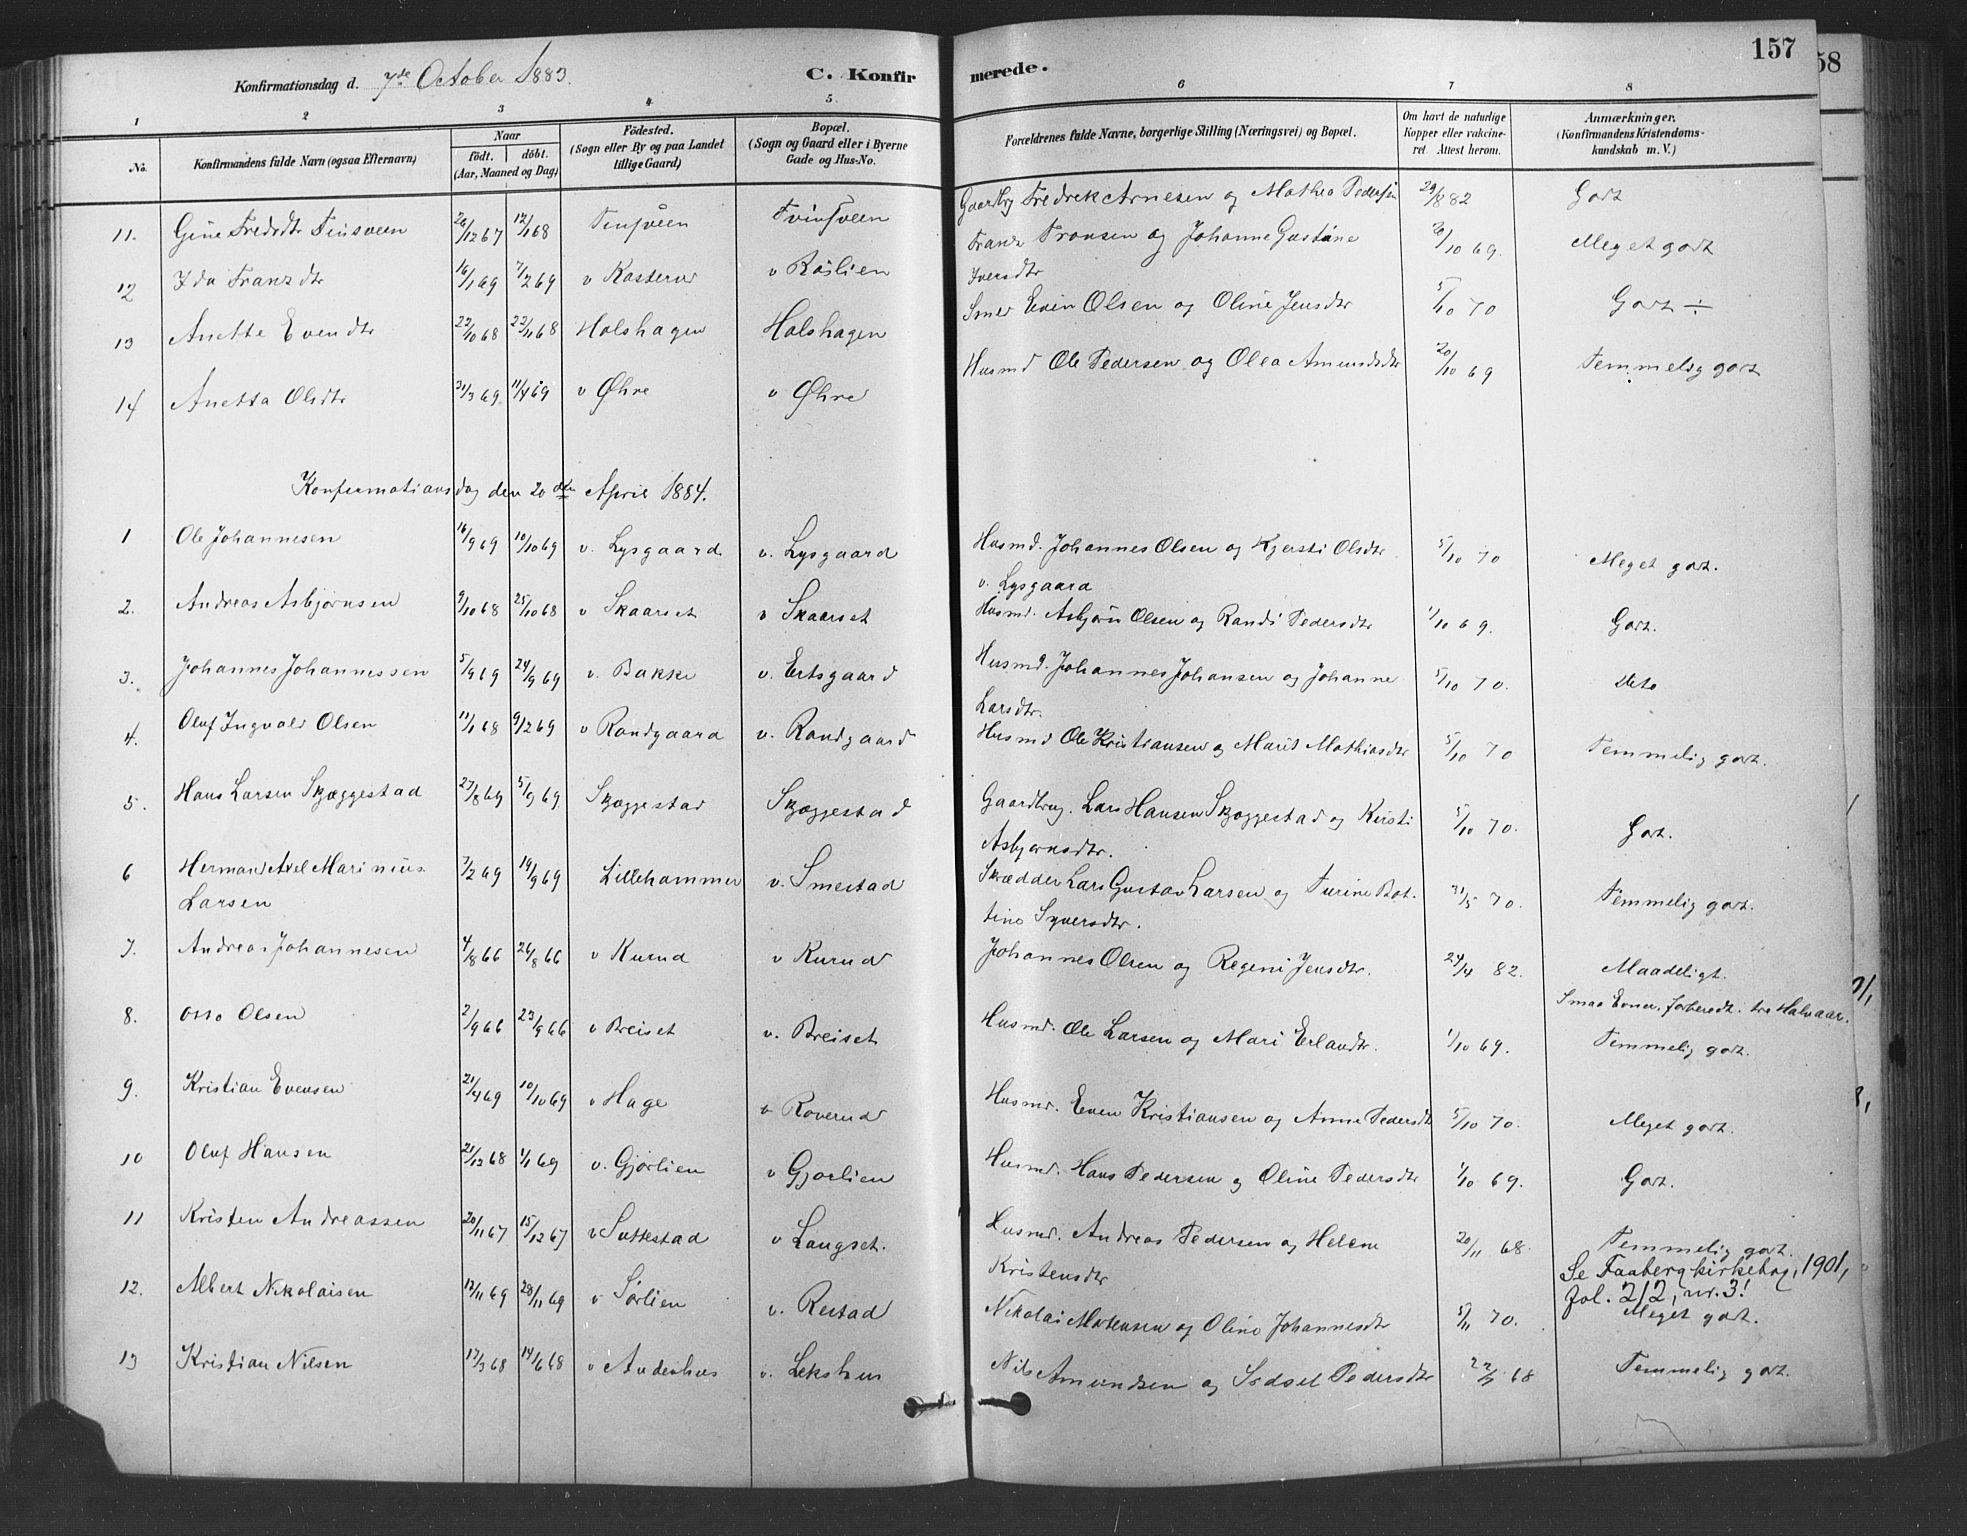 SAH, Fåberg prestekontor, Ministerialbok nr. 9, 1879-1898, s. 157